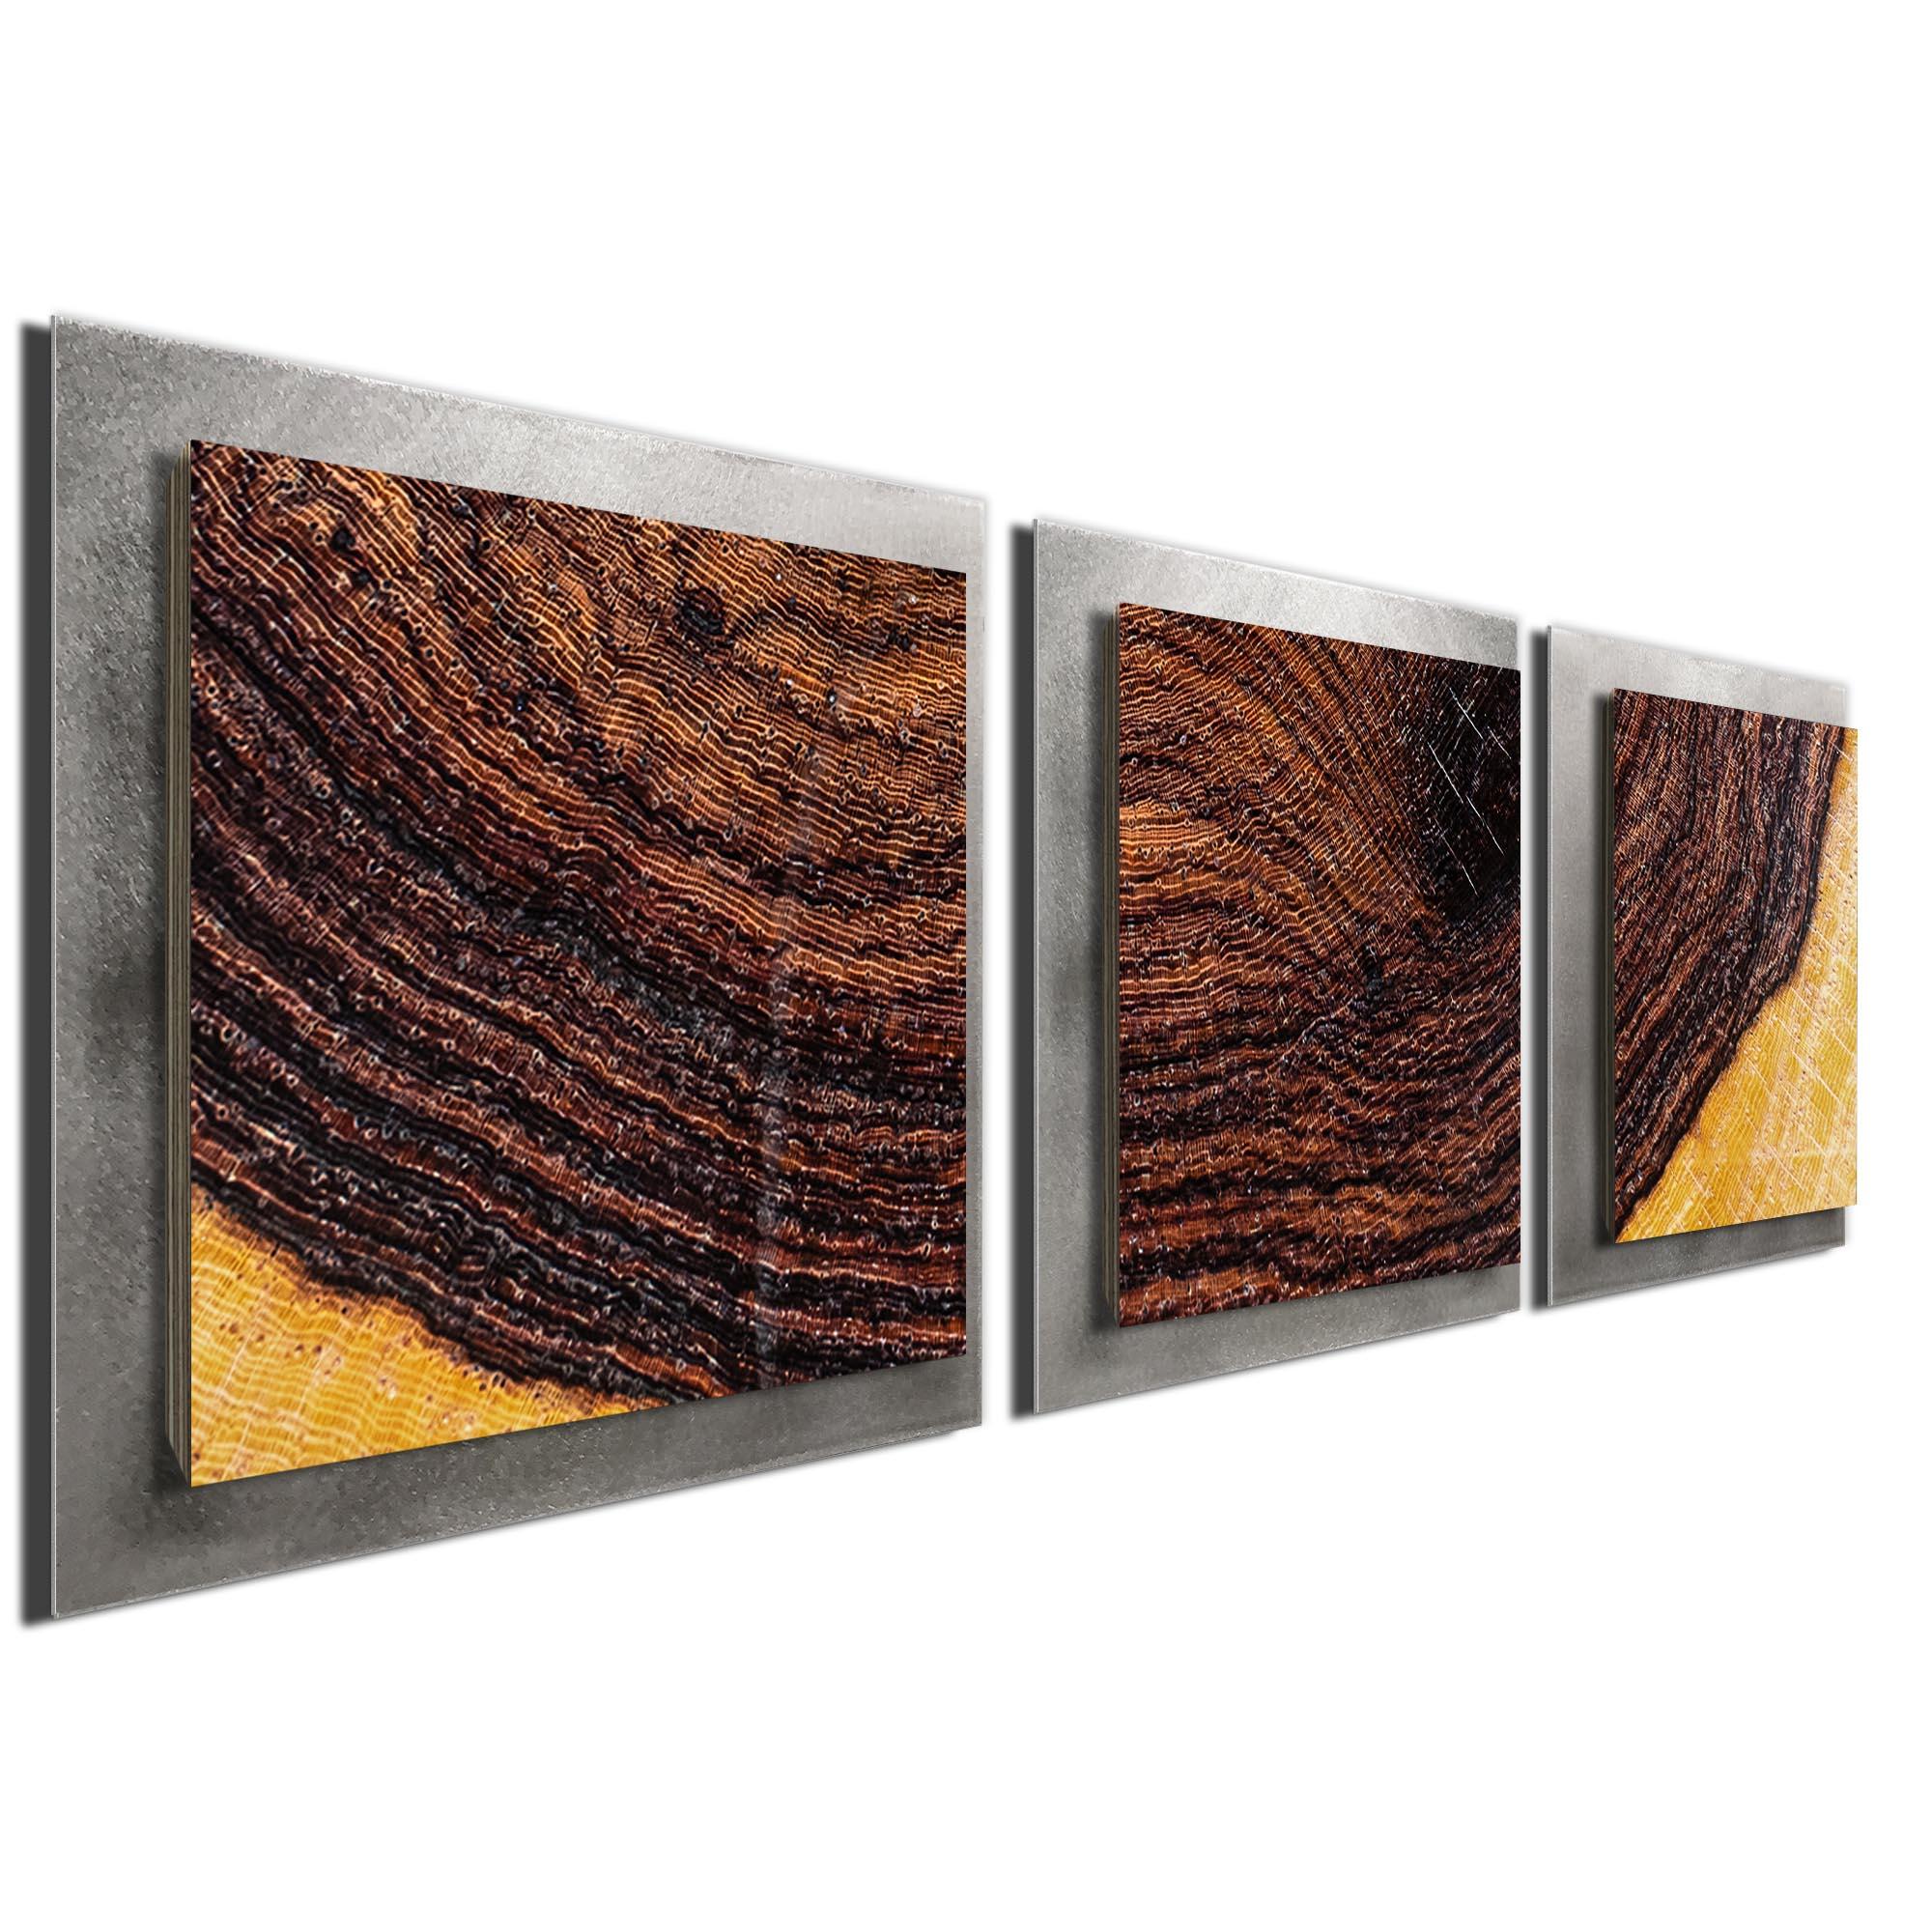 Bold Wood Essence Silver by Adam Schwoeppe Rustic Modern Style Wood Wall Art - Image 2